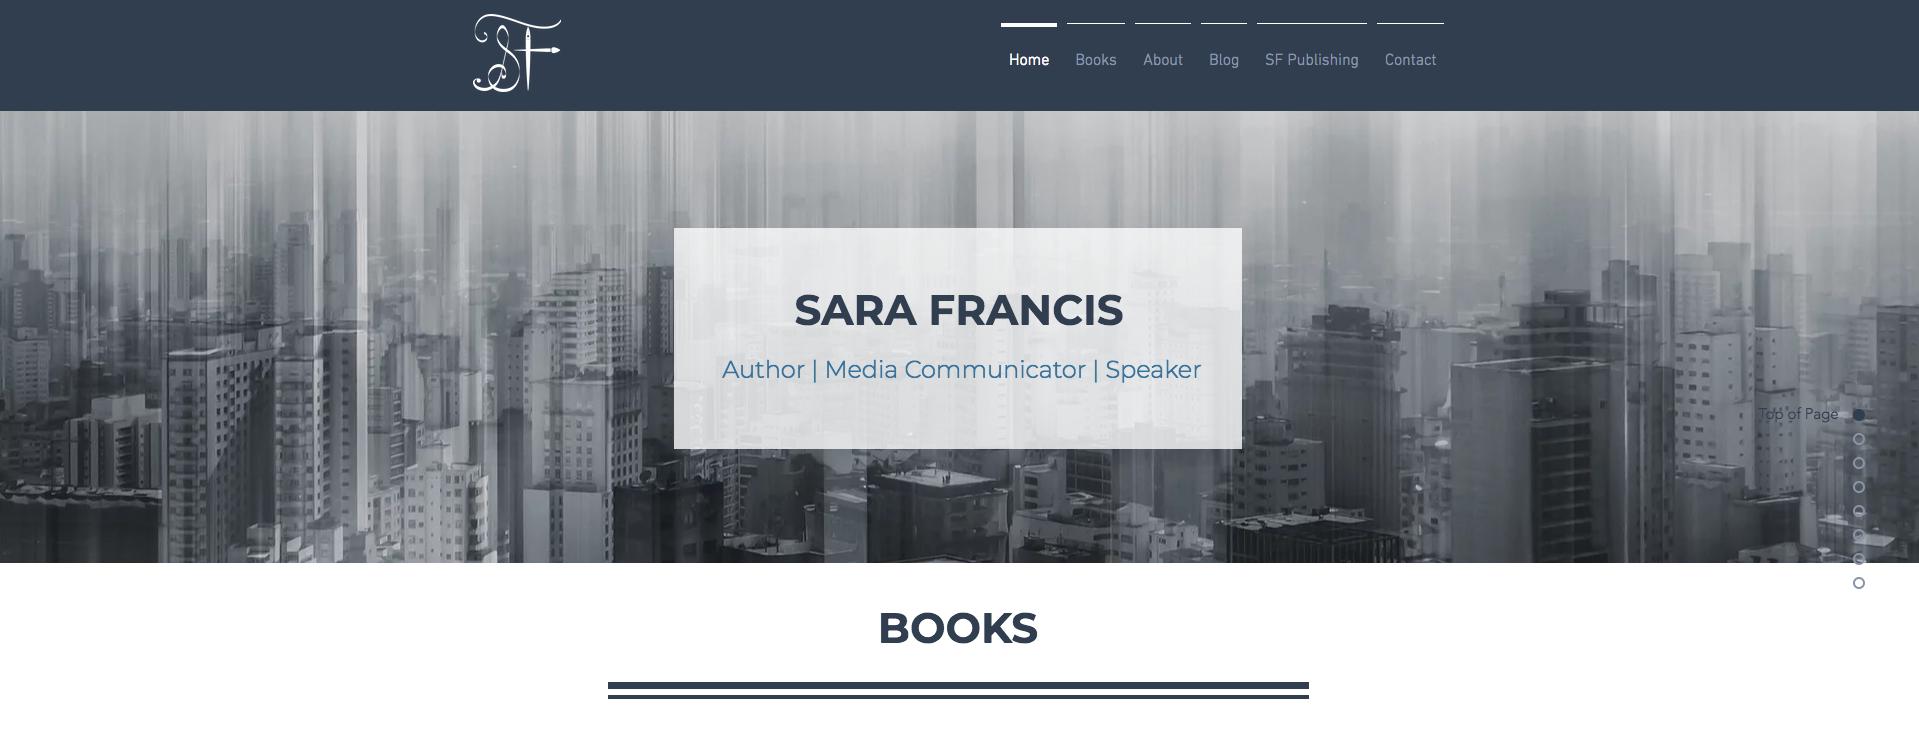 SF Publishing Web Design [LINK]